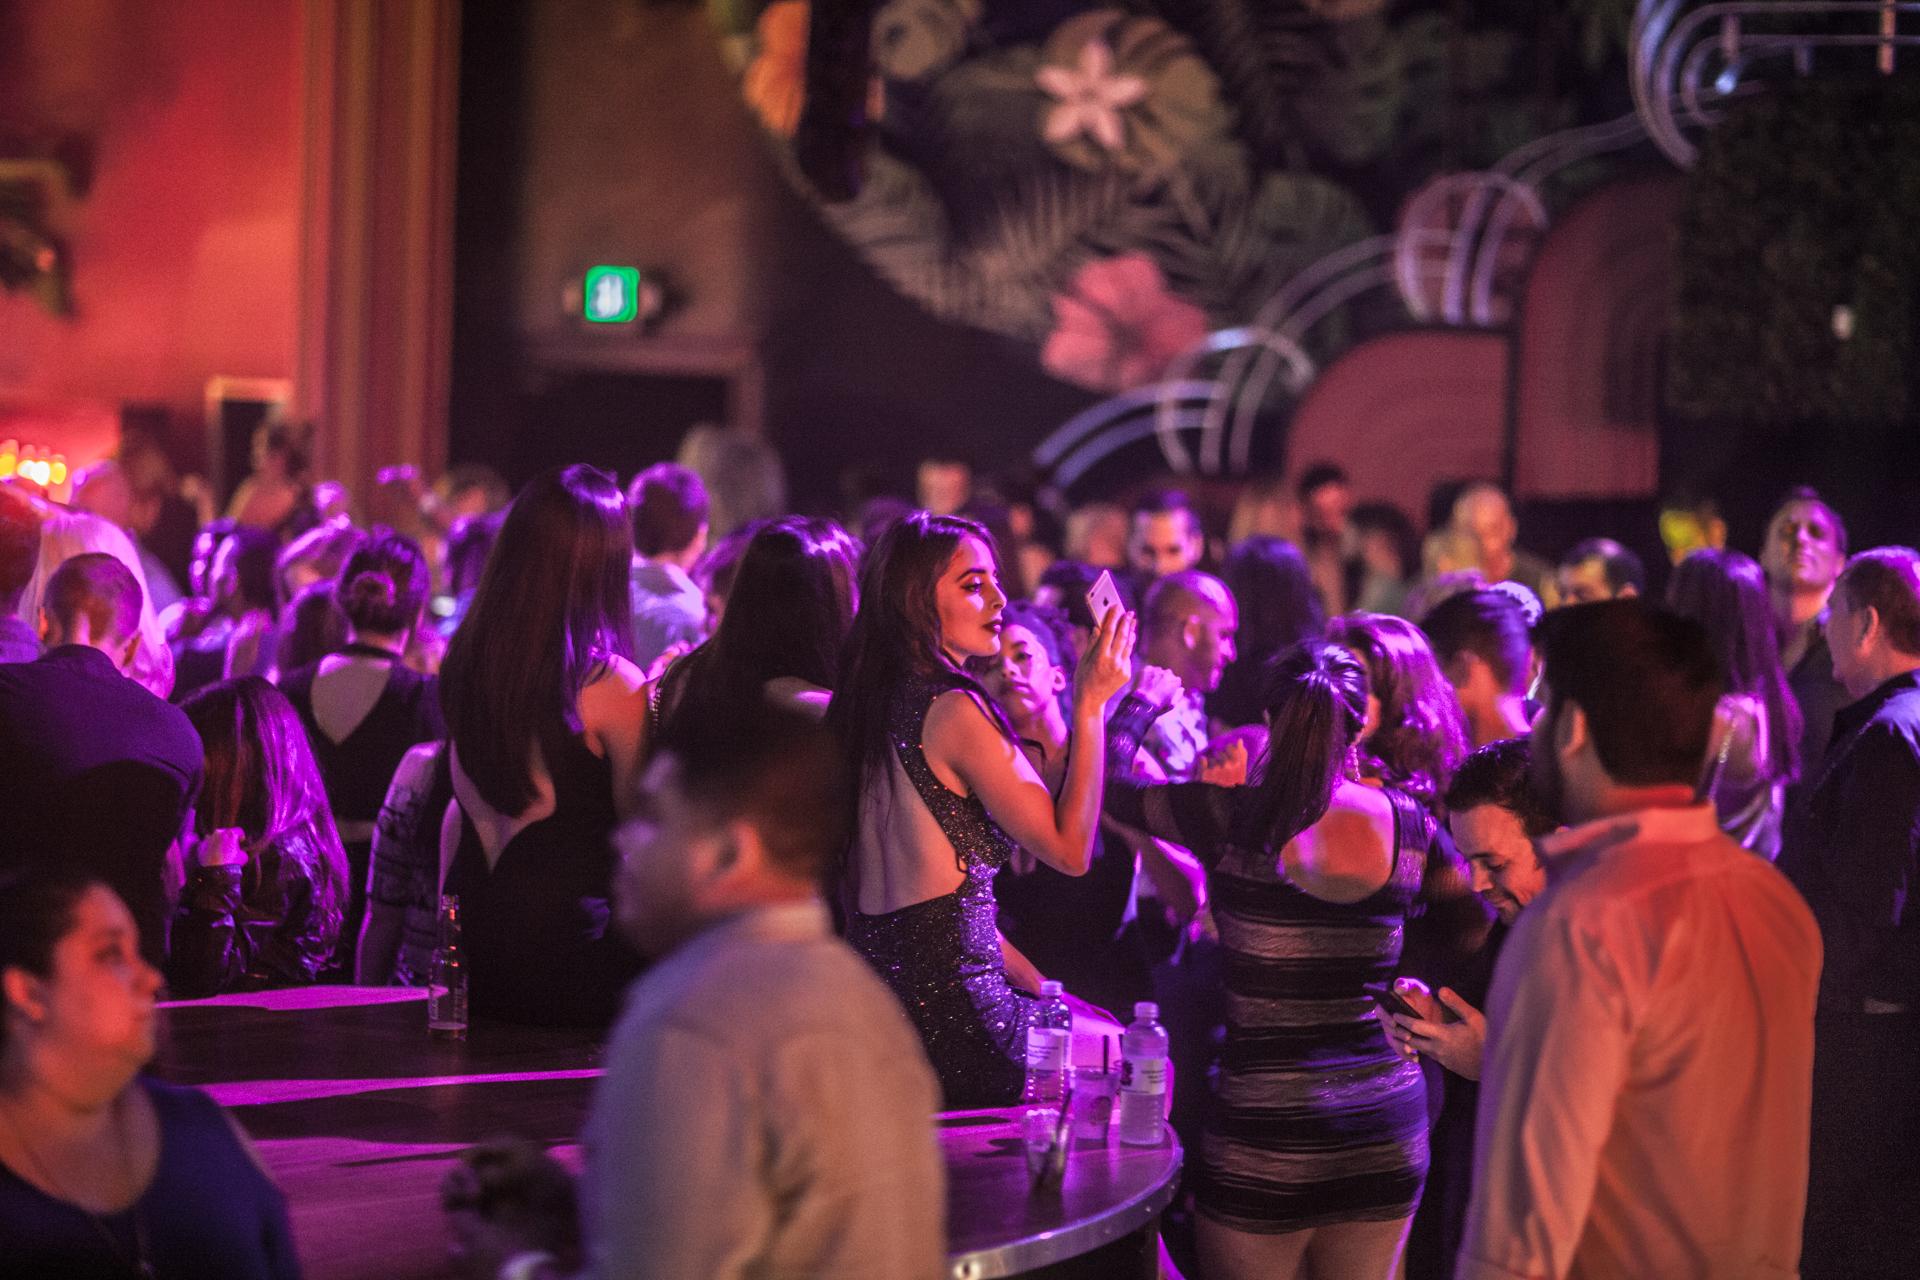 Copa Room Show & Nightclub - Miami Beach, FL